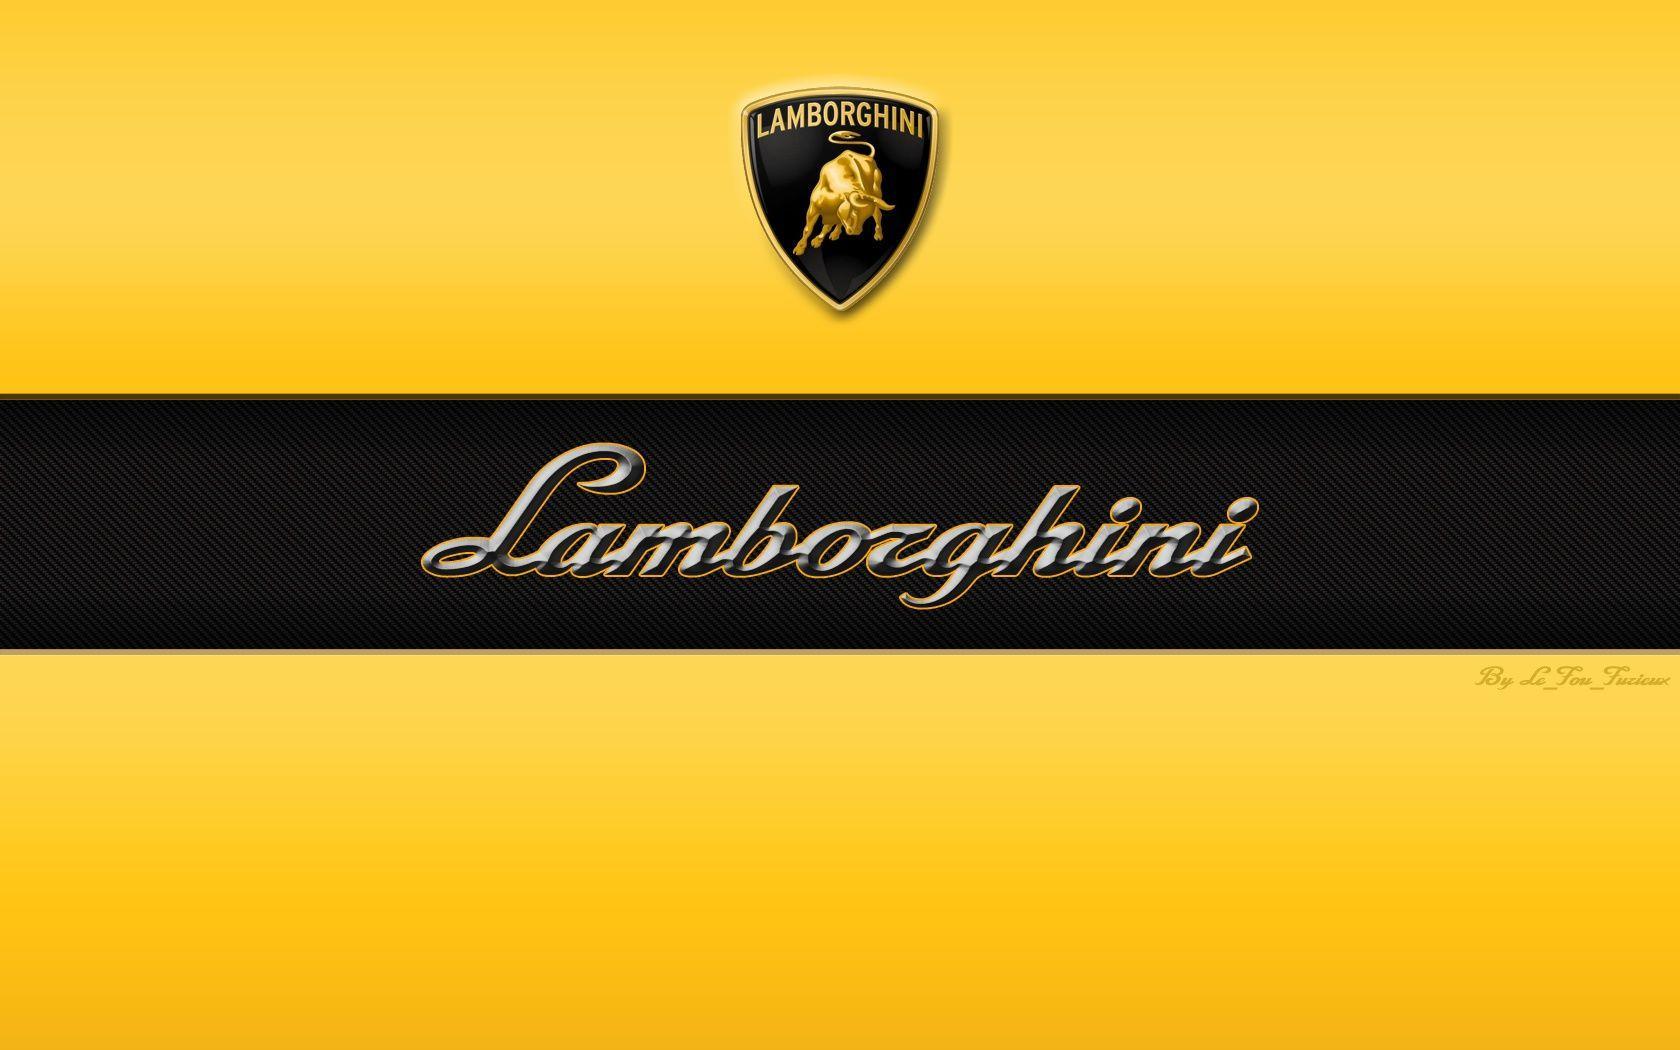 1600x900 Lamborghini Logo 3D Wallpaper